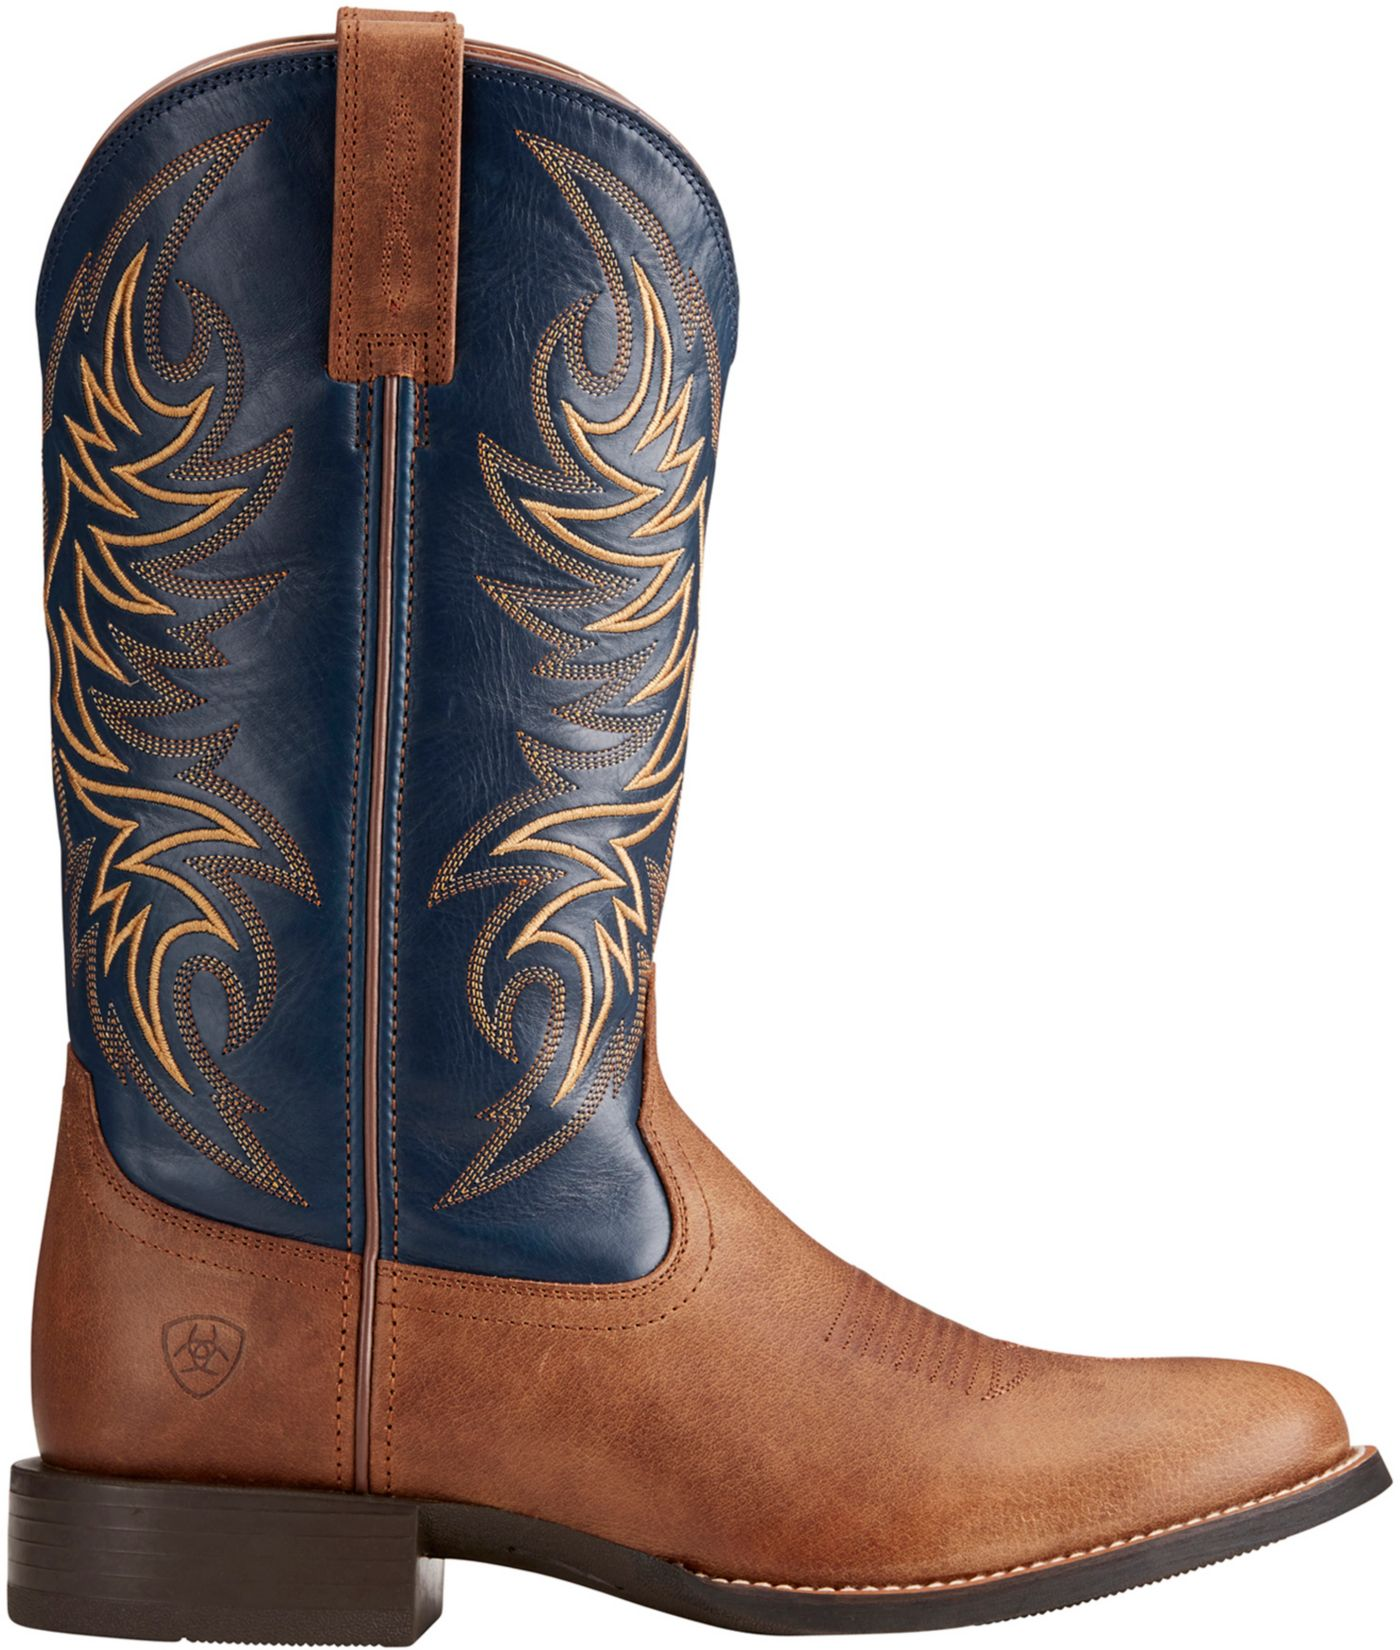 Ariat Men's Sport Horseman Western Work Boots